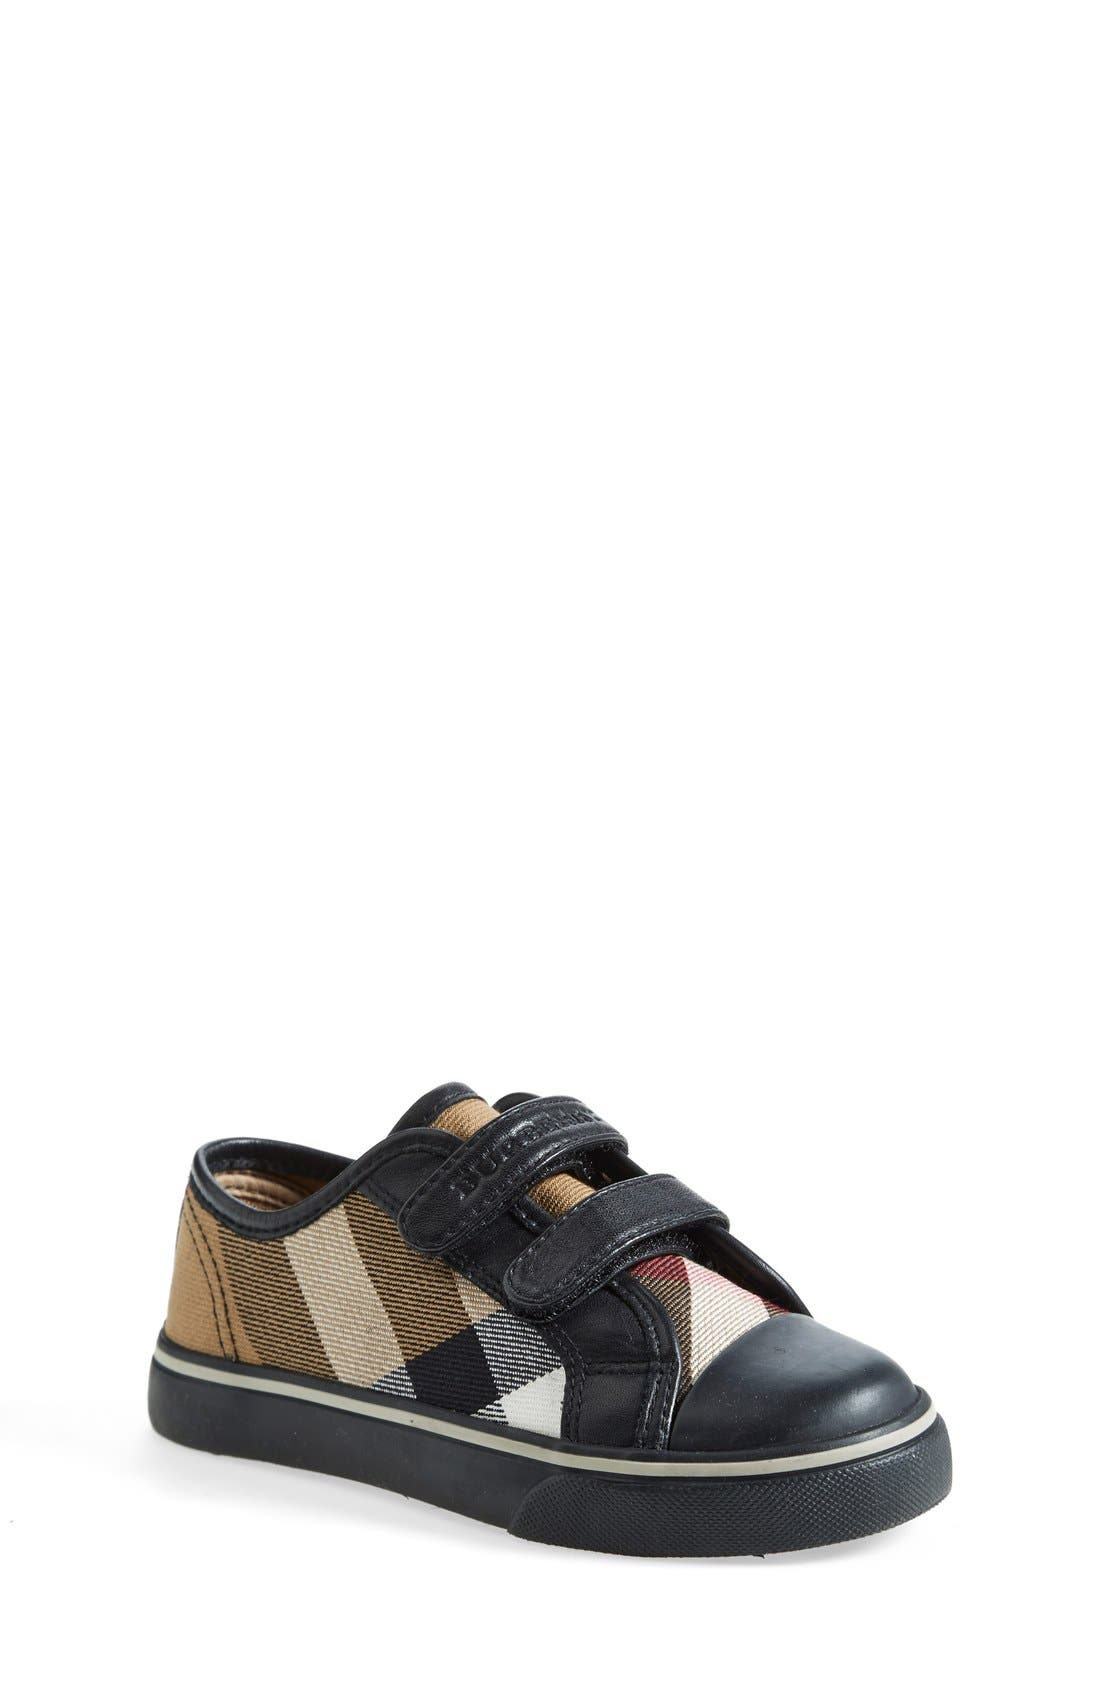 Alternate Image 1 Selected - Burberry 'Pete' Sneaker (Baby, Walker, Toddler &  Little Kid)